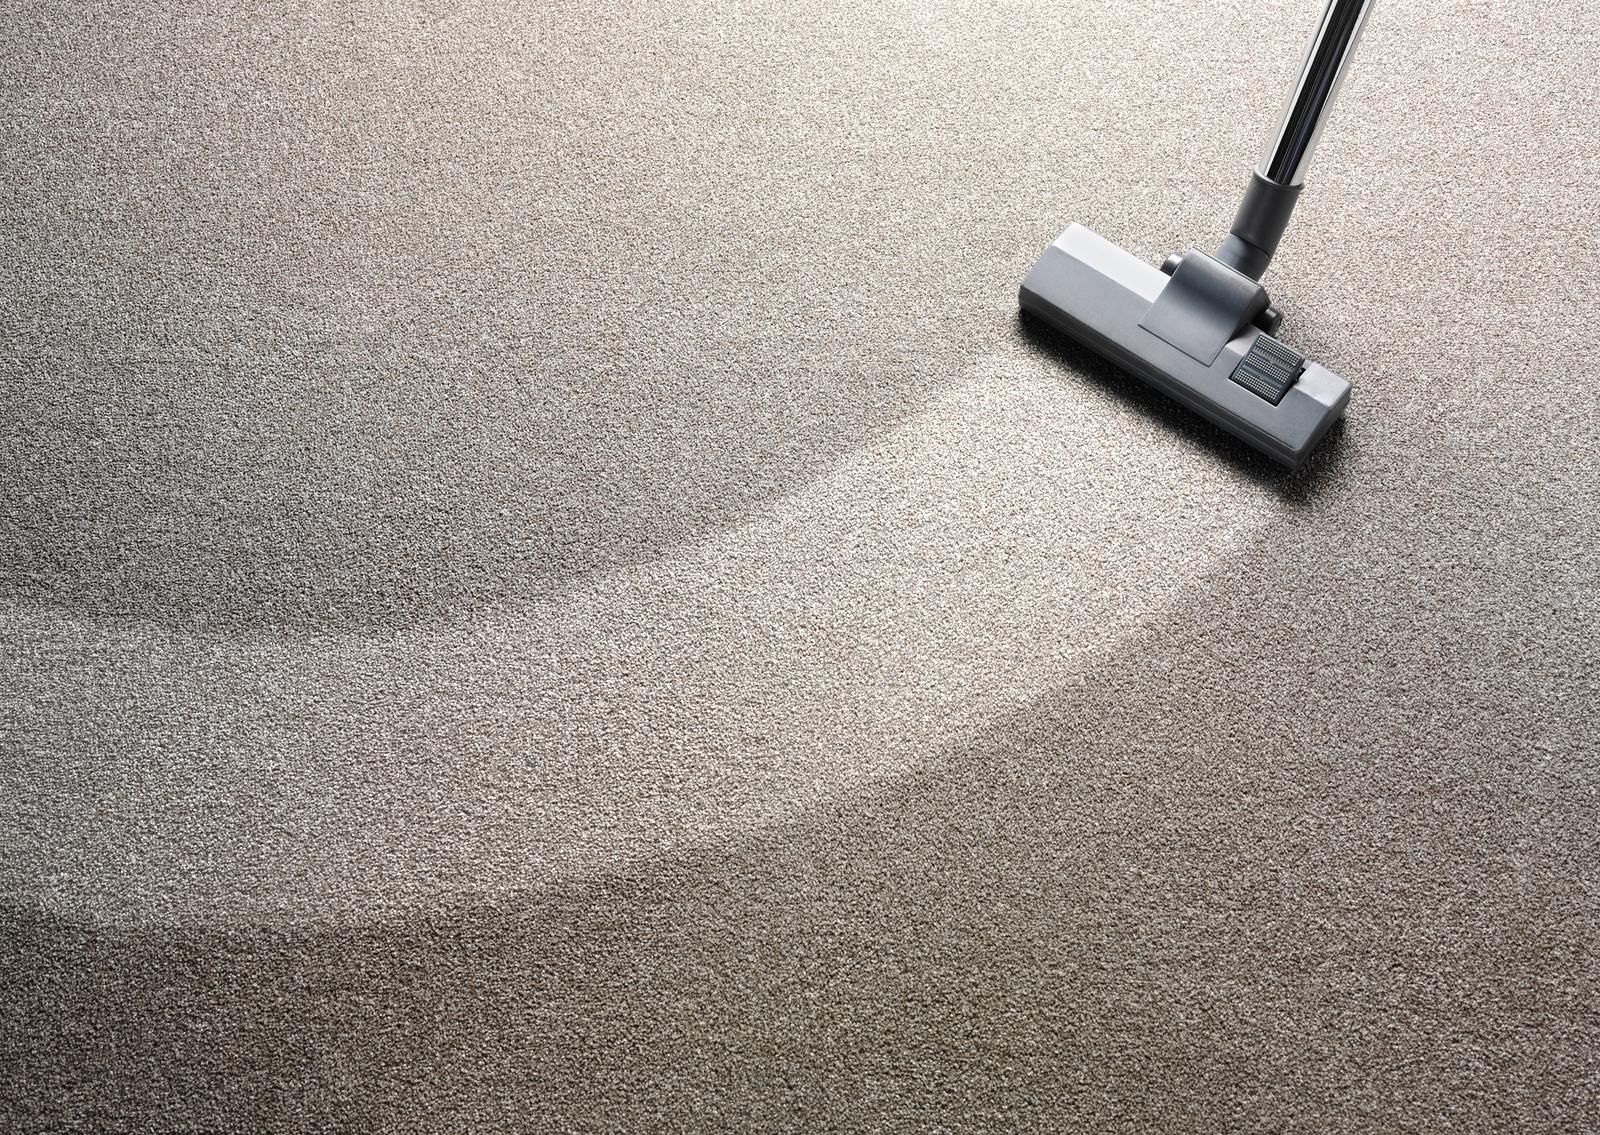 bigstock-Vacuum-Cleaner-on-a-Carpet-76438247